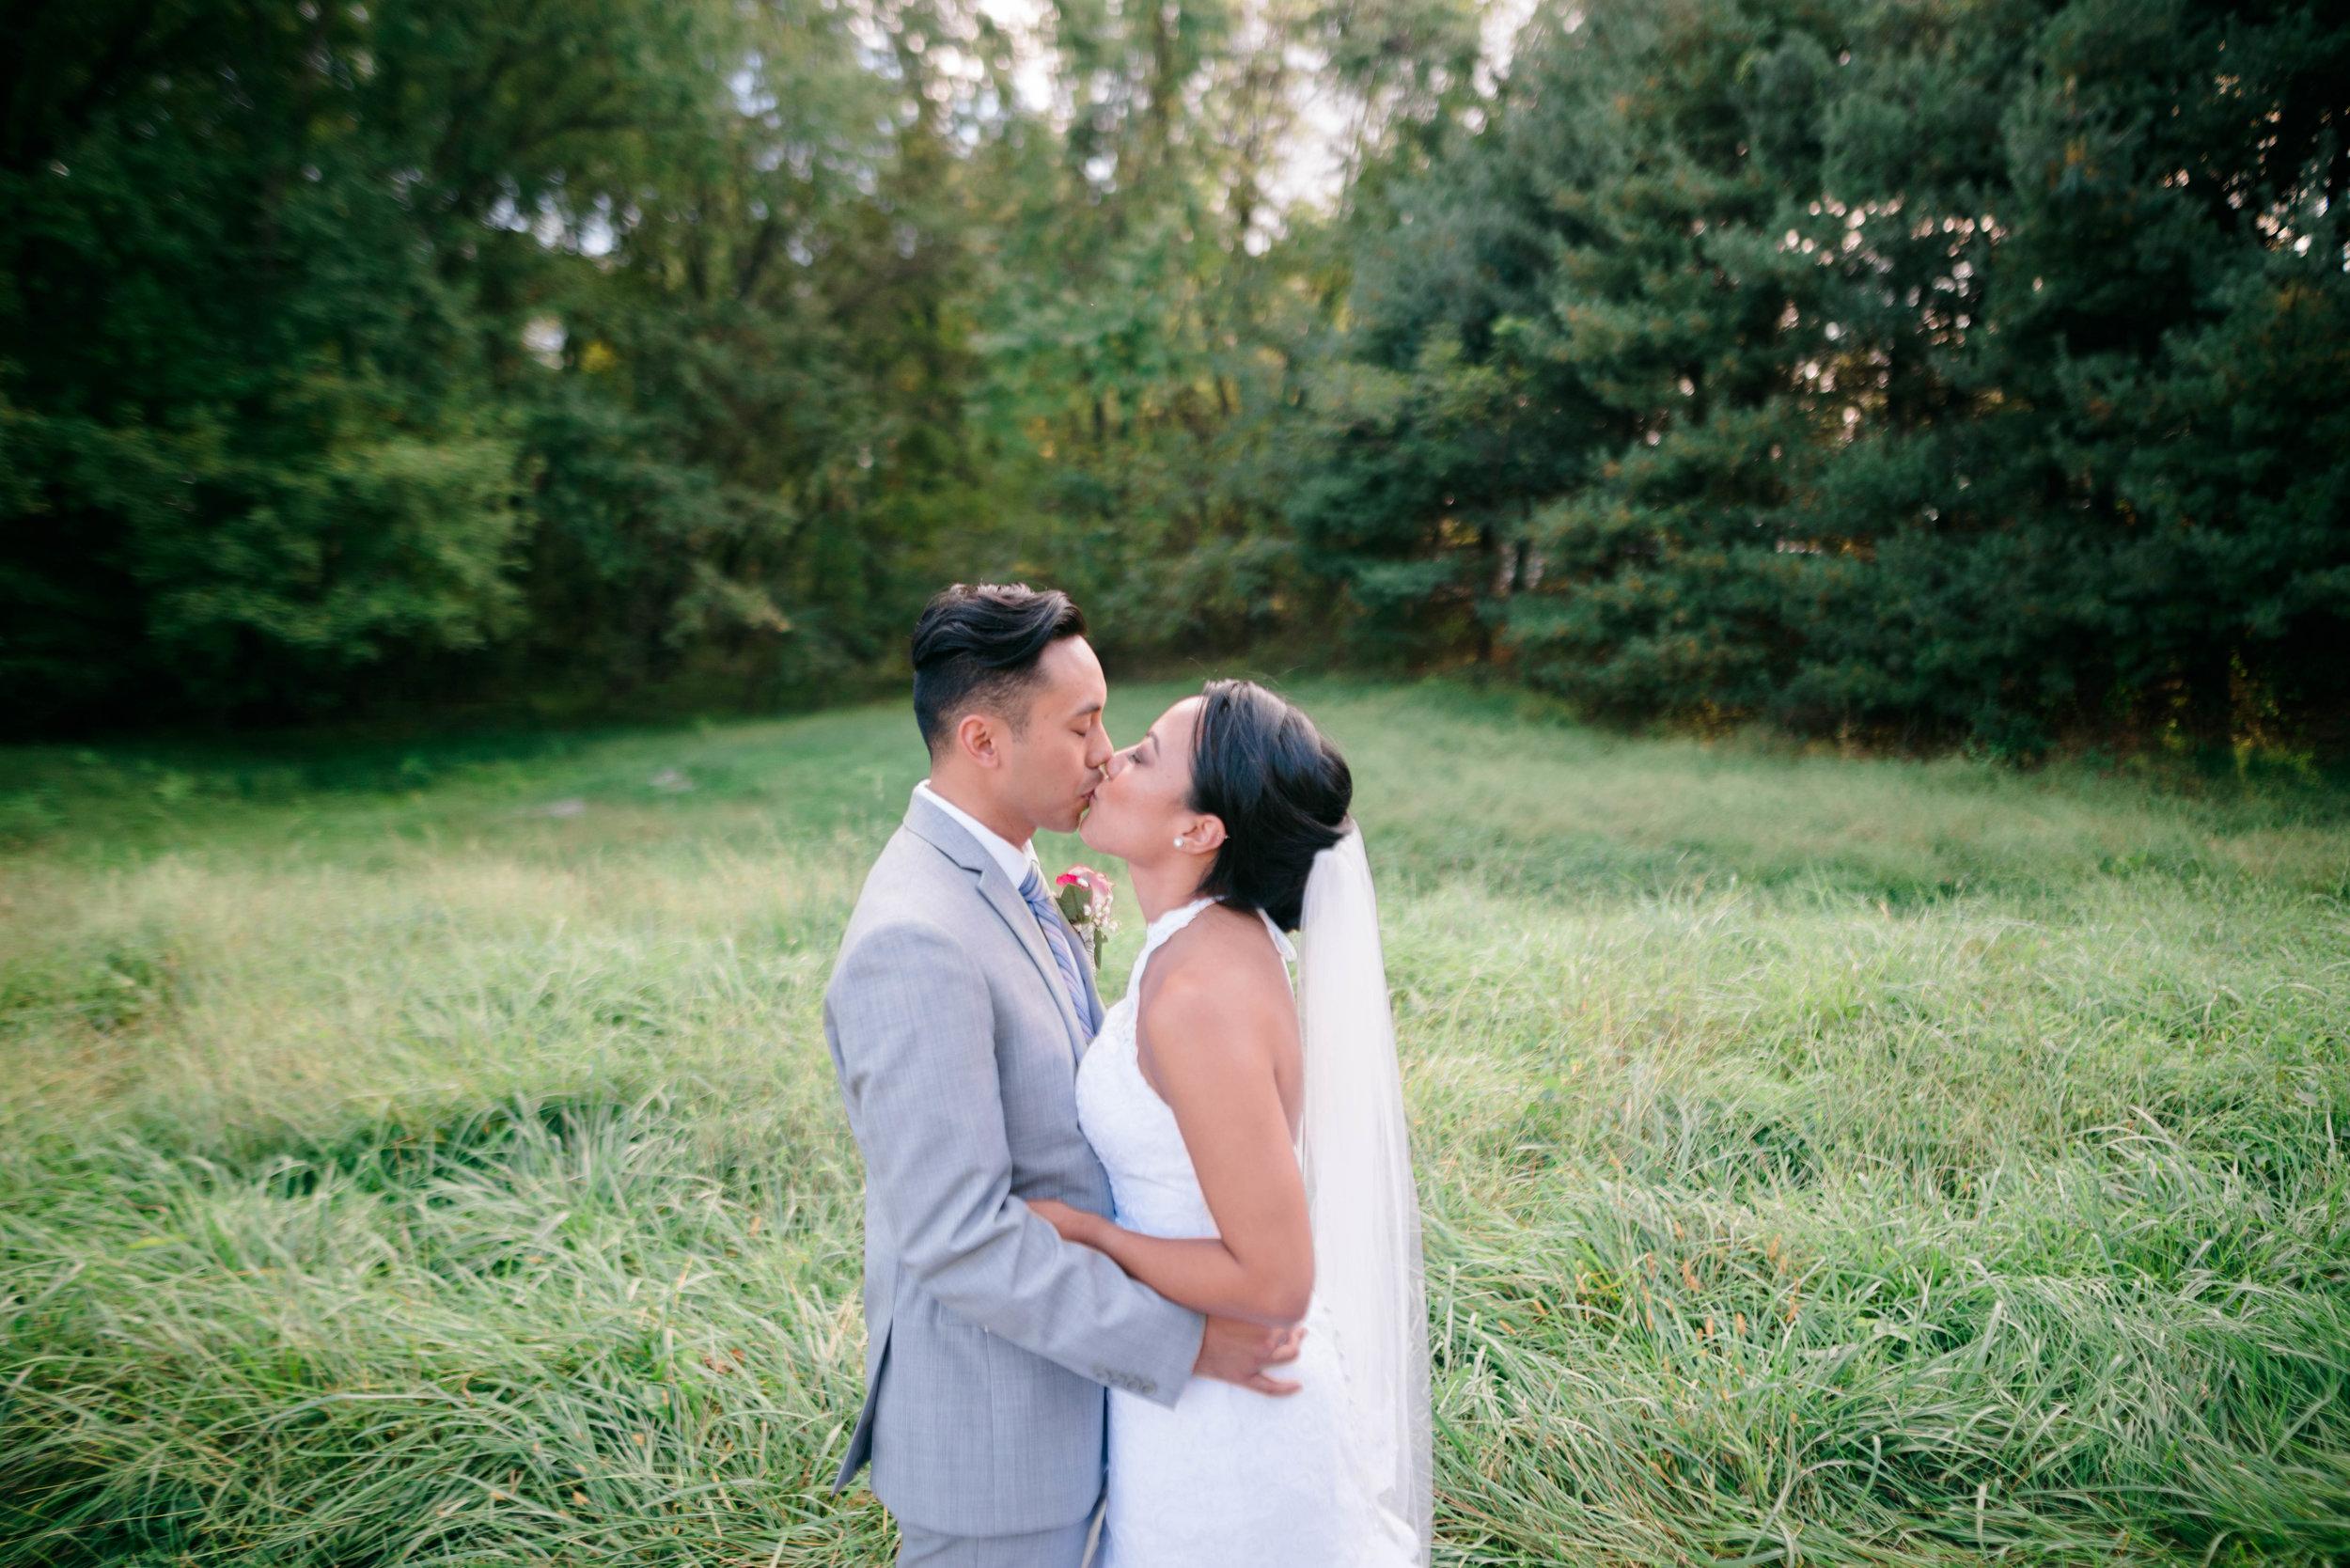 silverspring-maryland-wedding-icaimages